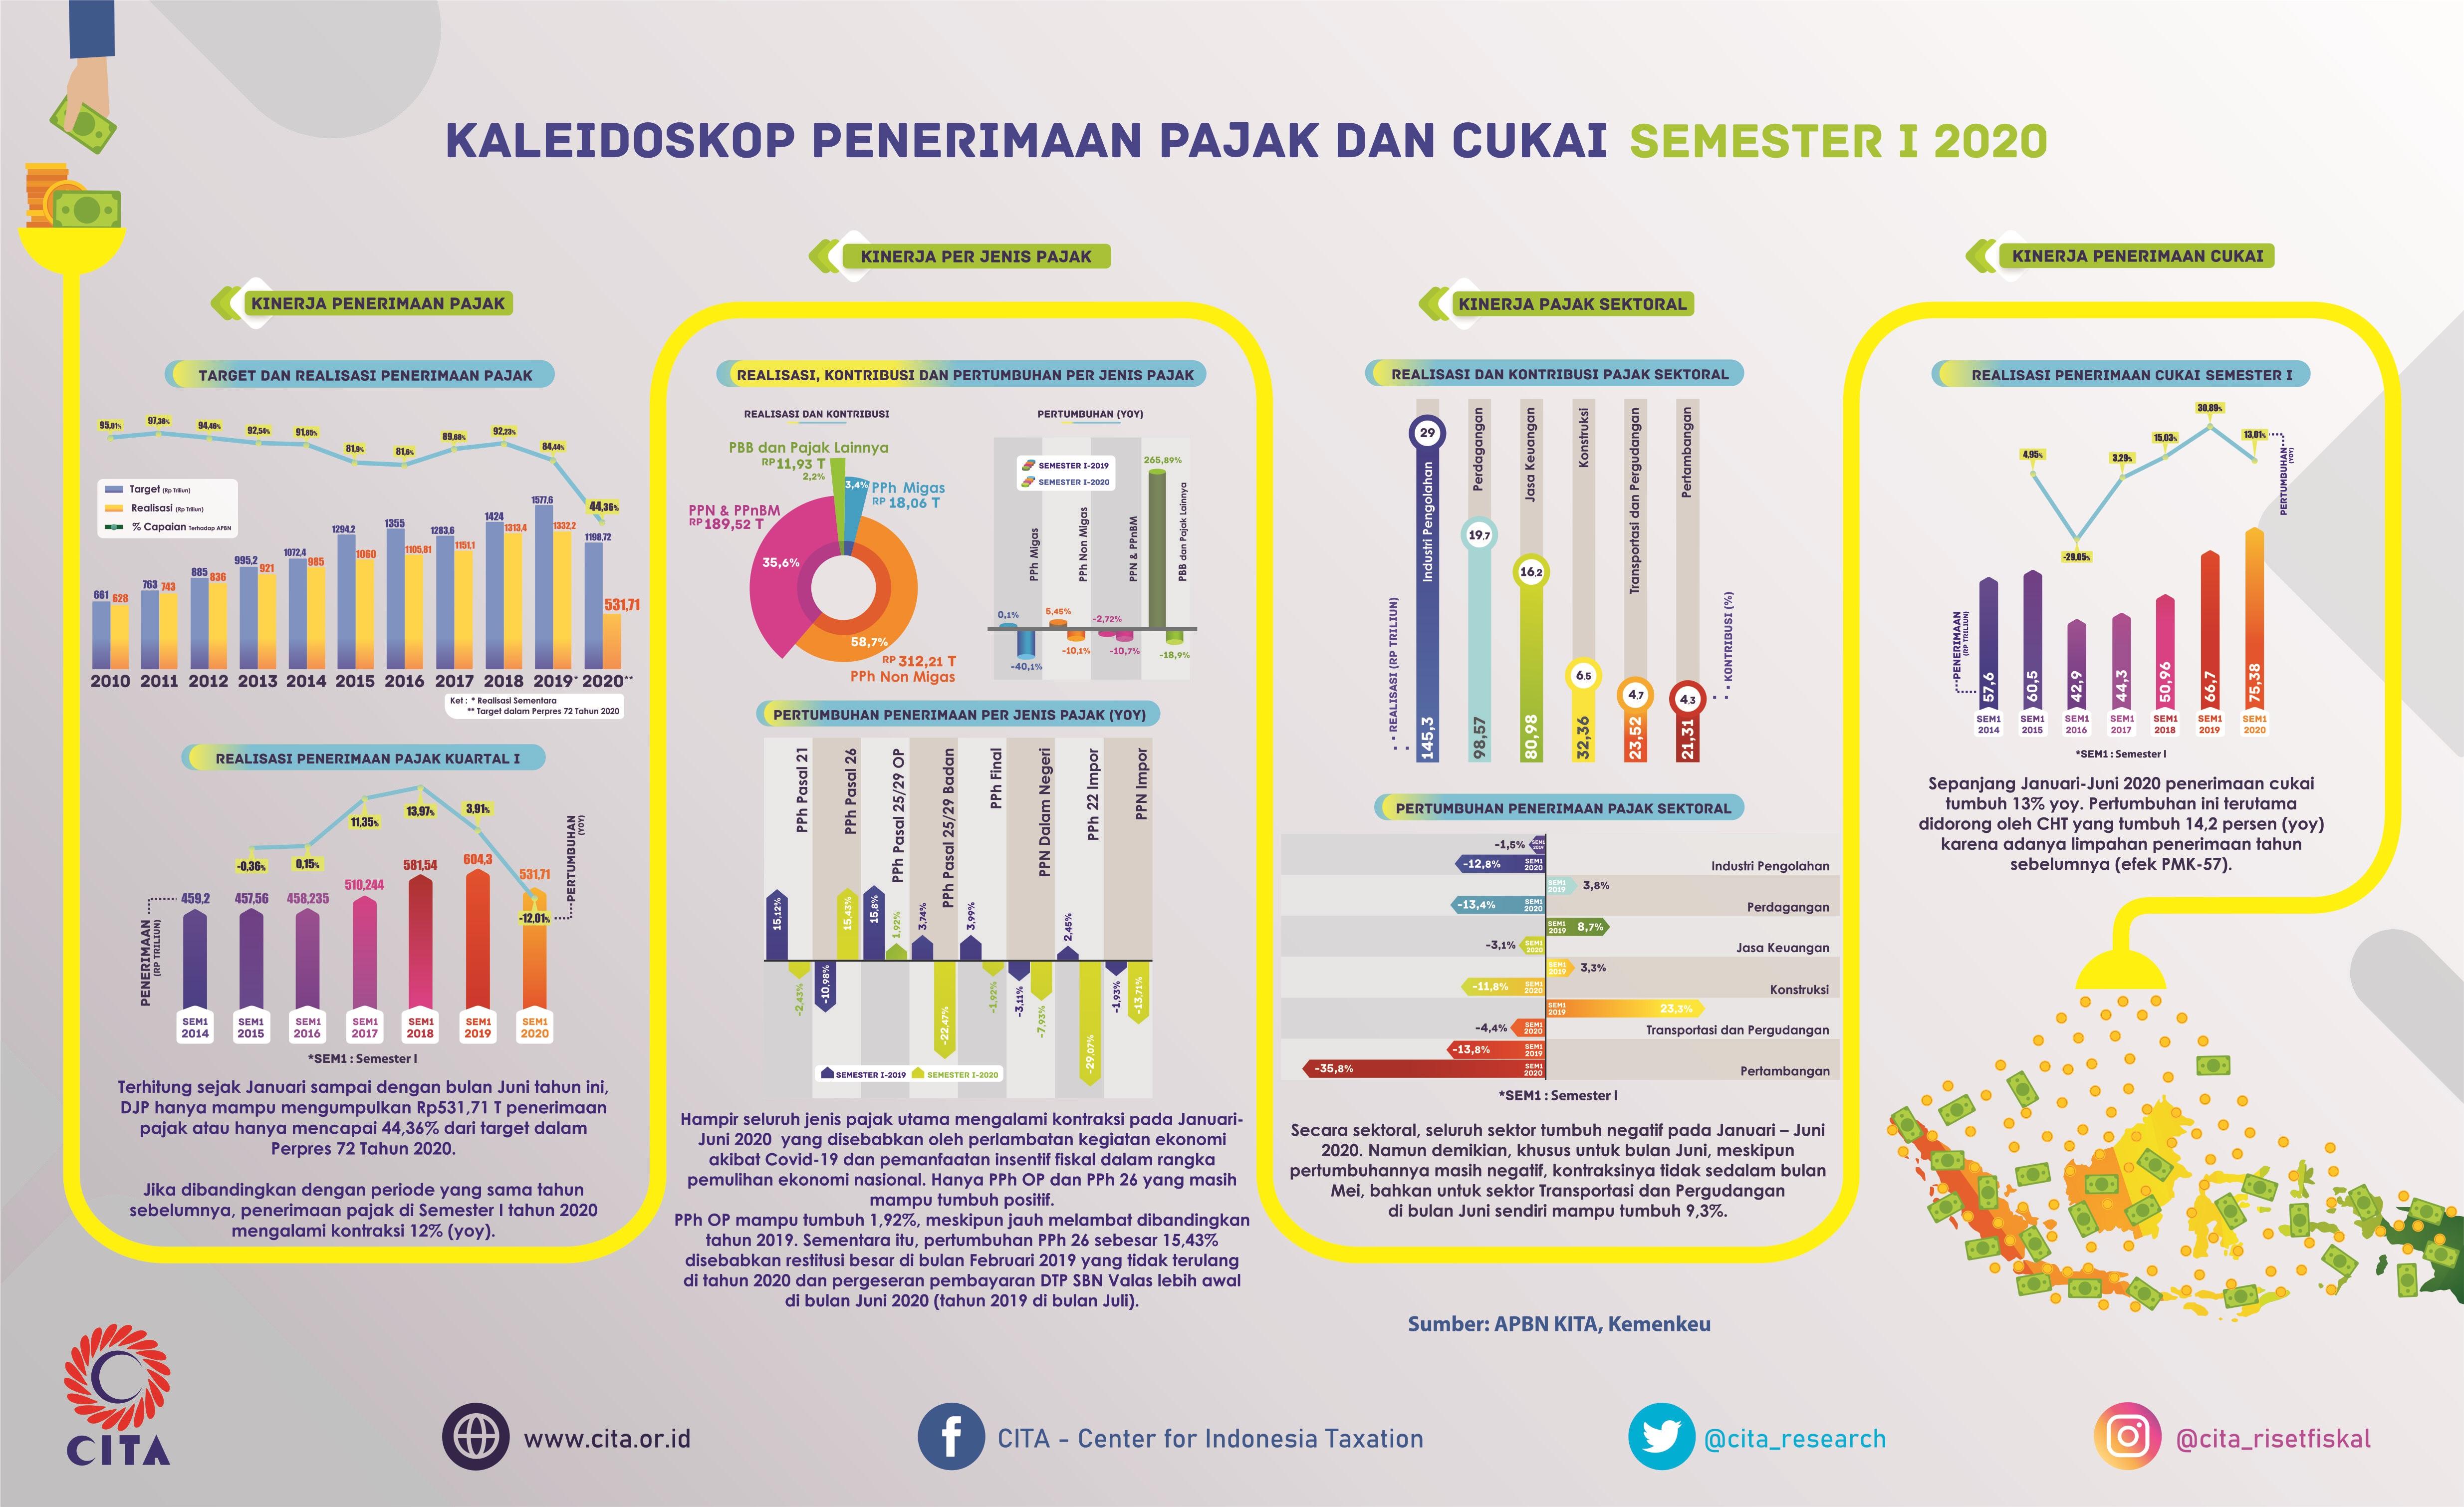 Kaleidoskop Penerimaan Pajak dan Cukai Semester I - 2020